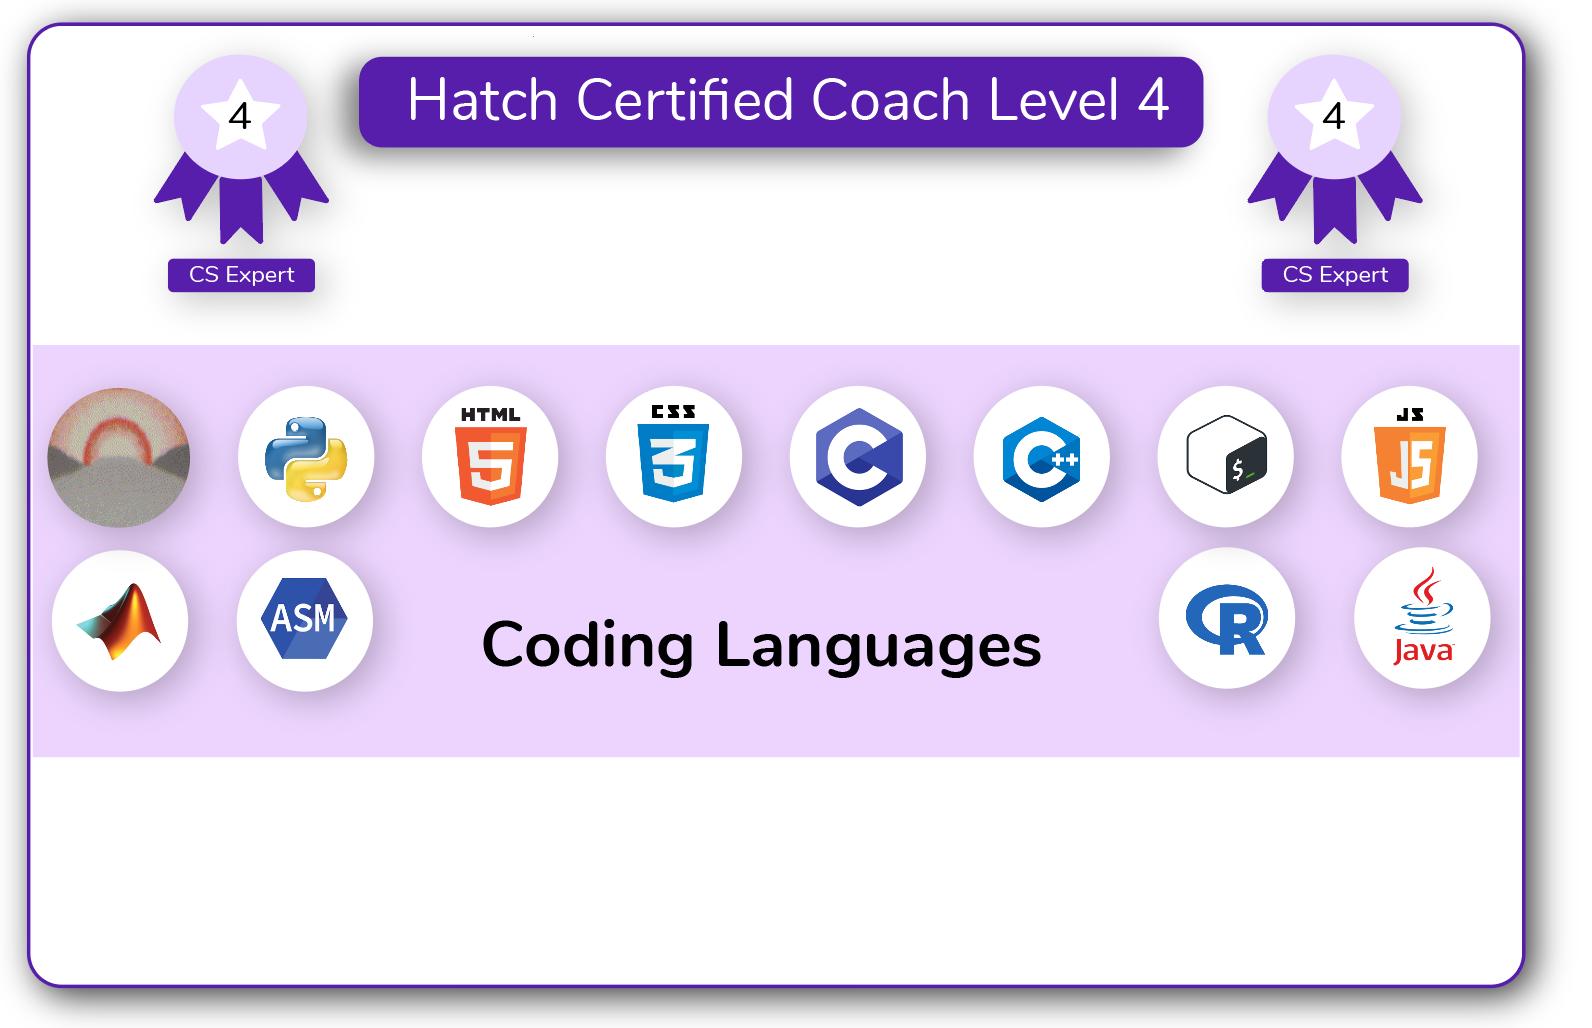 Coach Certification Level